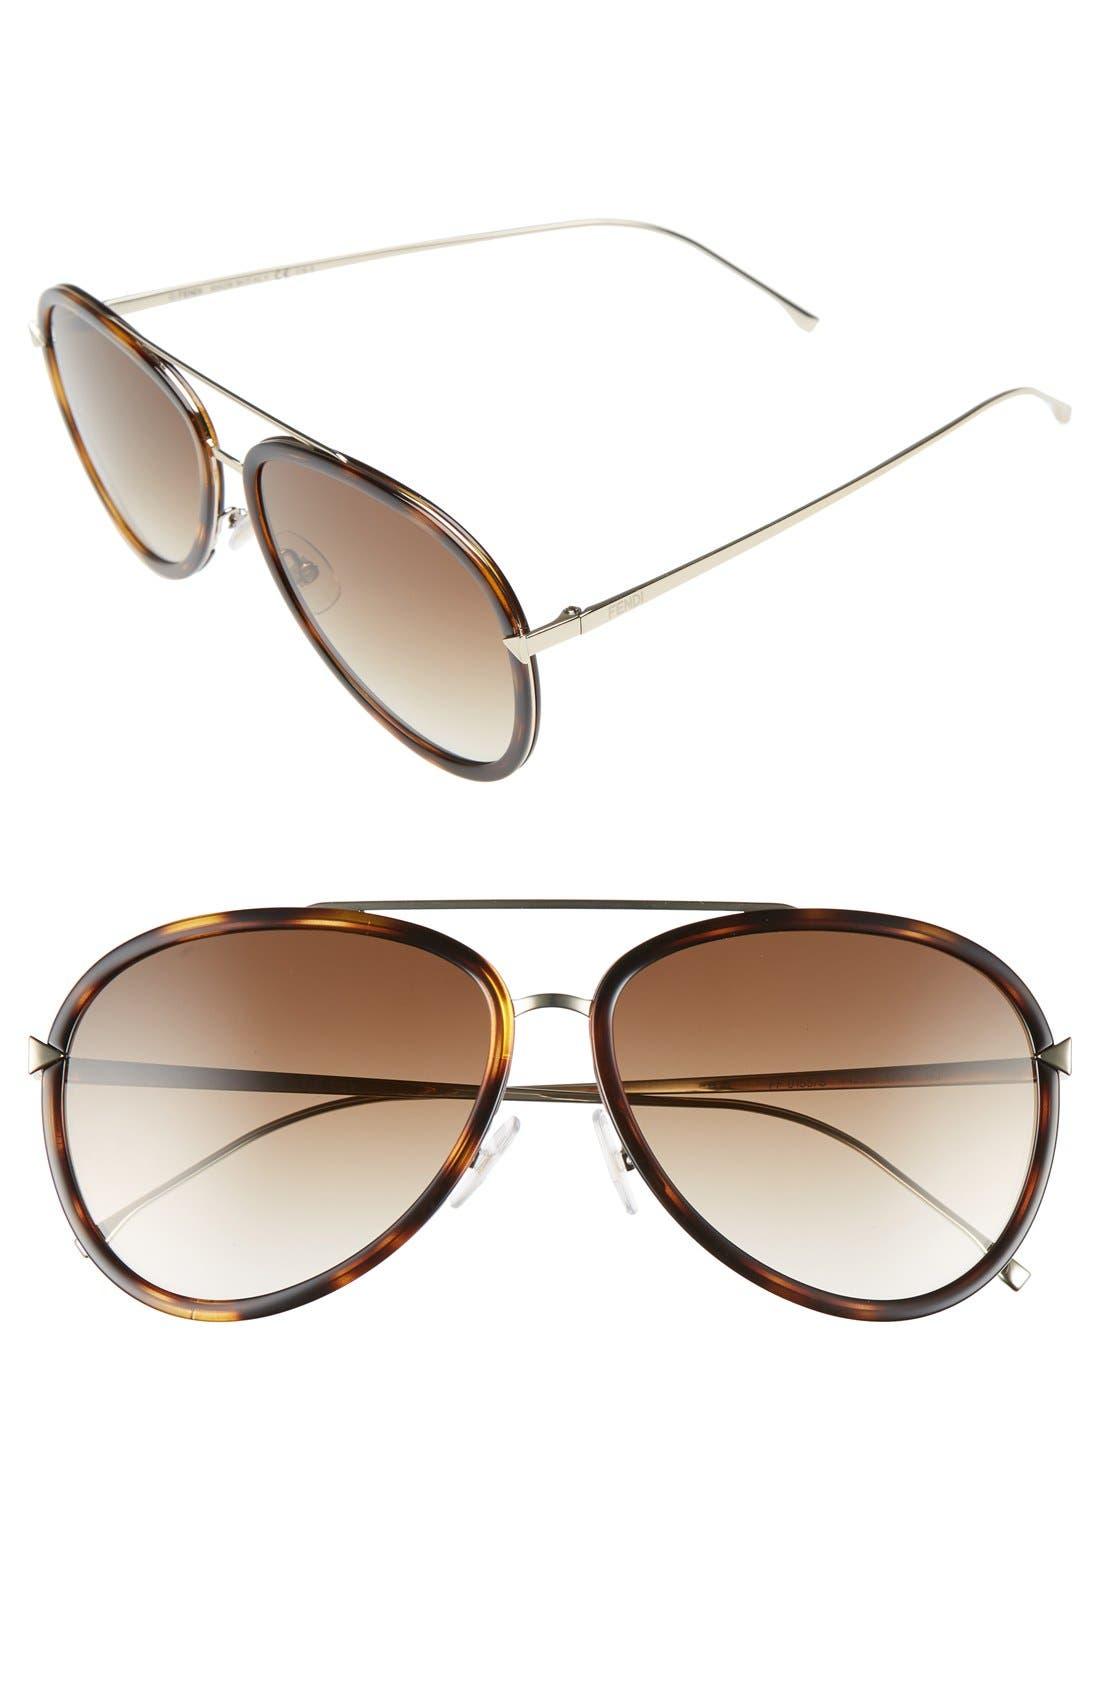 Alternate Image 1 Selected - Fendi 57mm Aviator Sunglasses